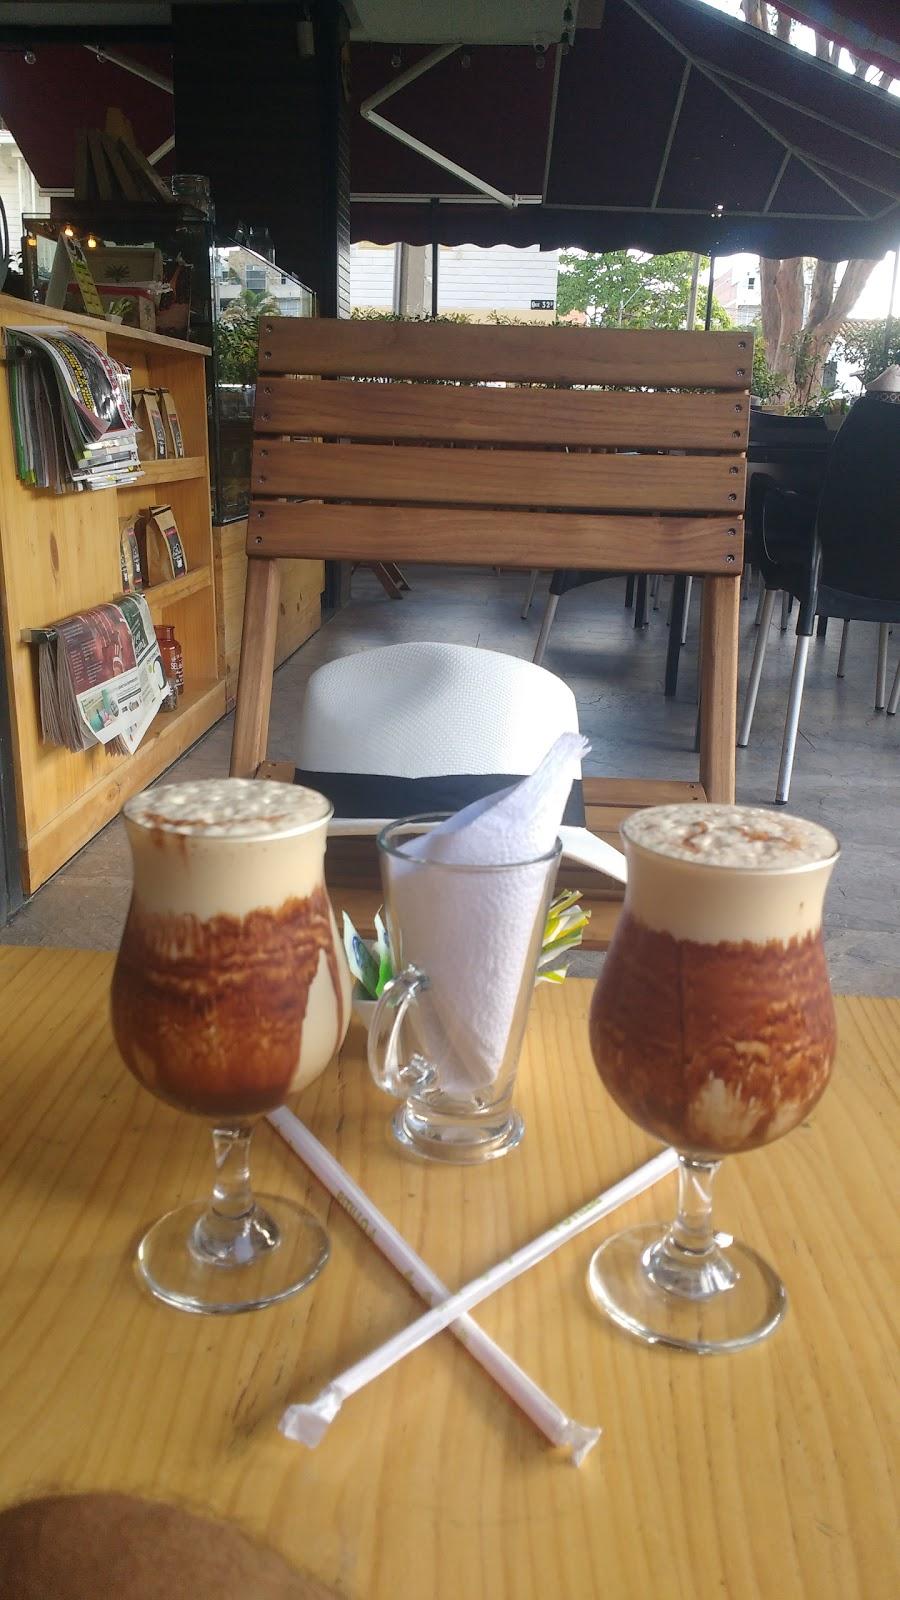 Café Opal: A Work-Friendly Place in Medellin